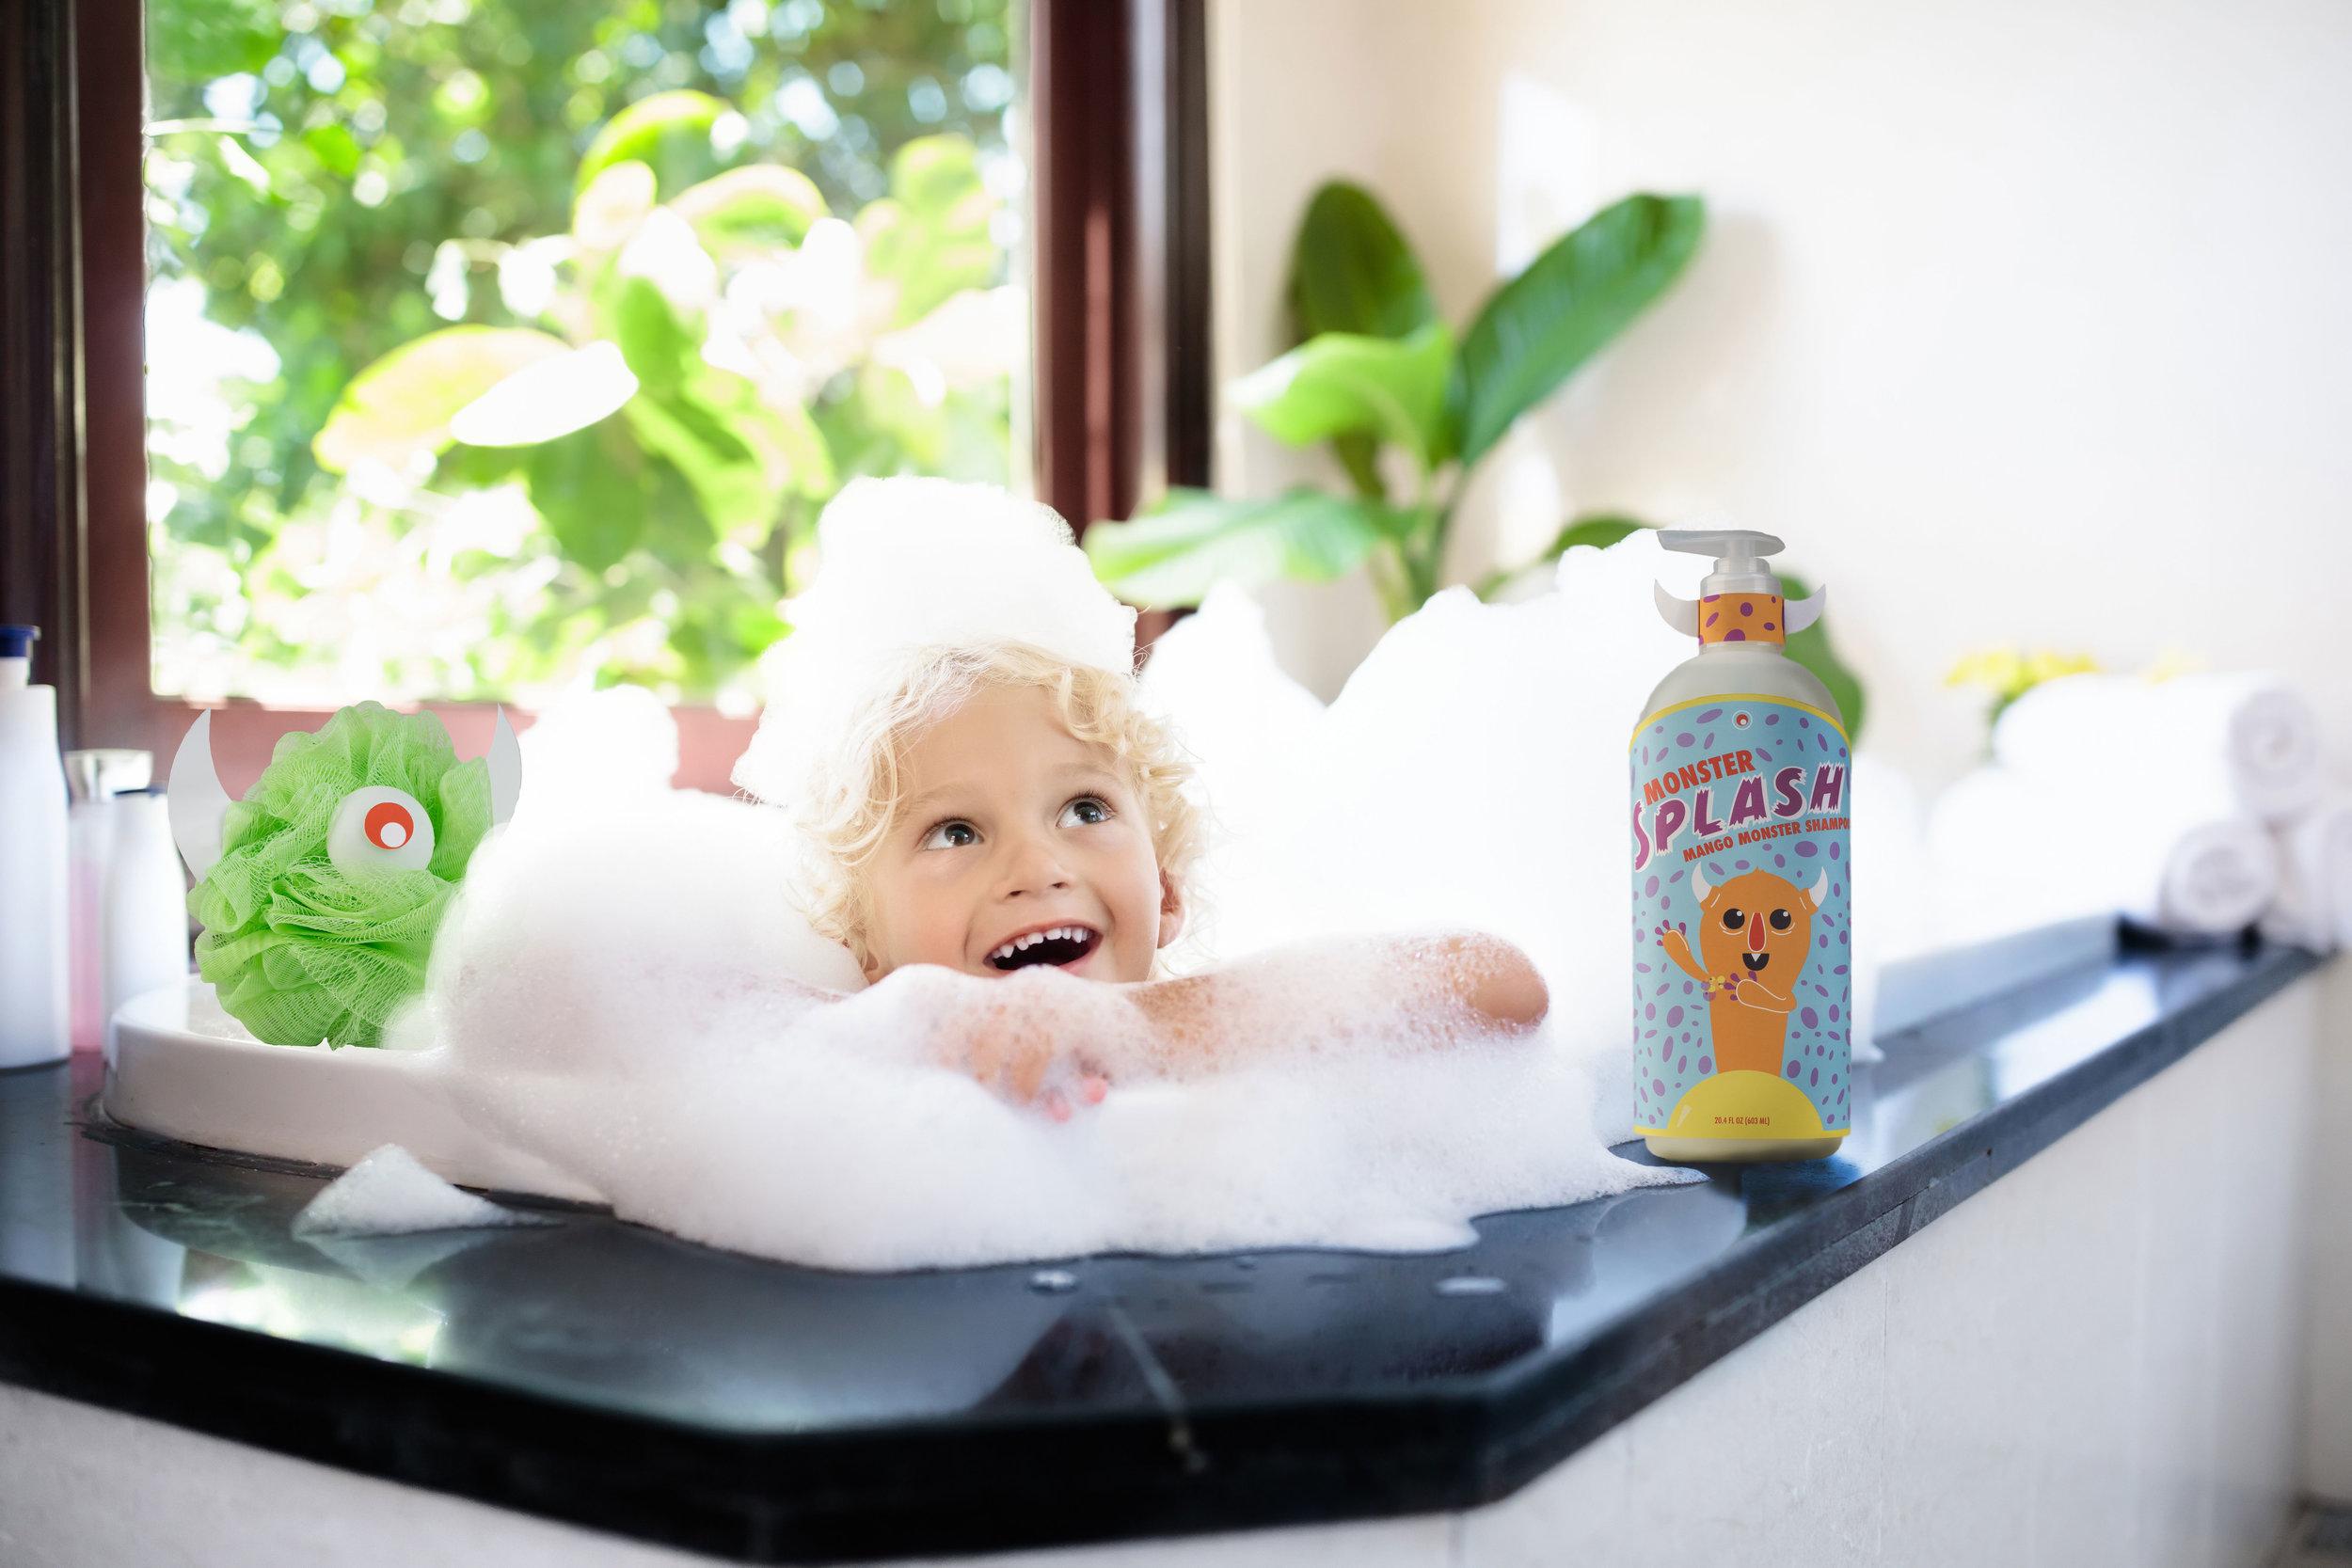 Monster Splash - Bring Fun Back to Bath time